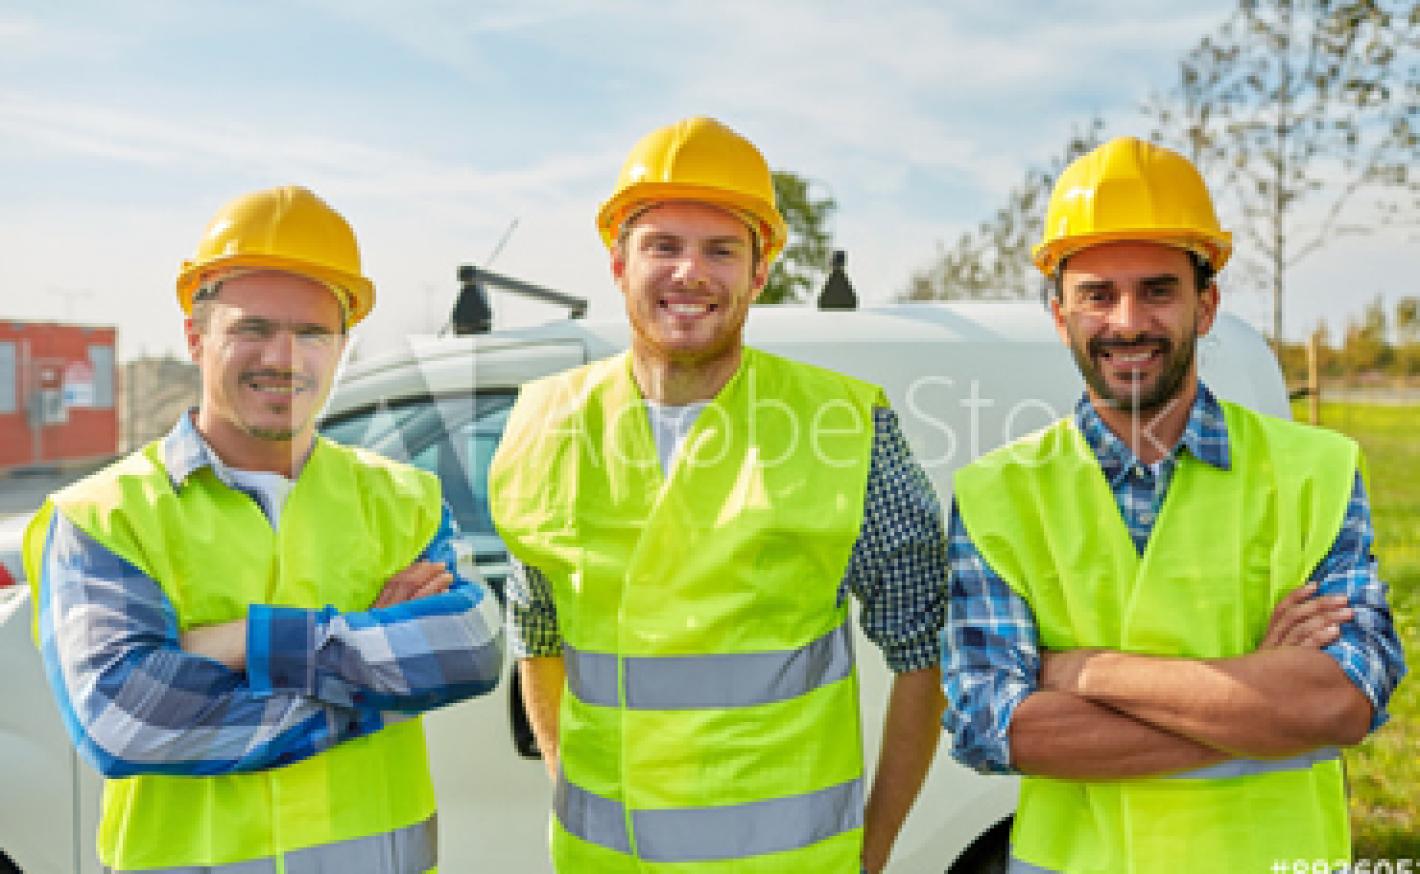 Manufacturer Spotlight: 3A Safety